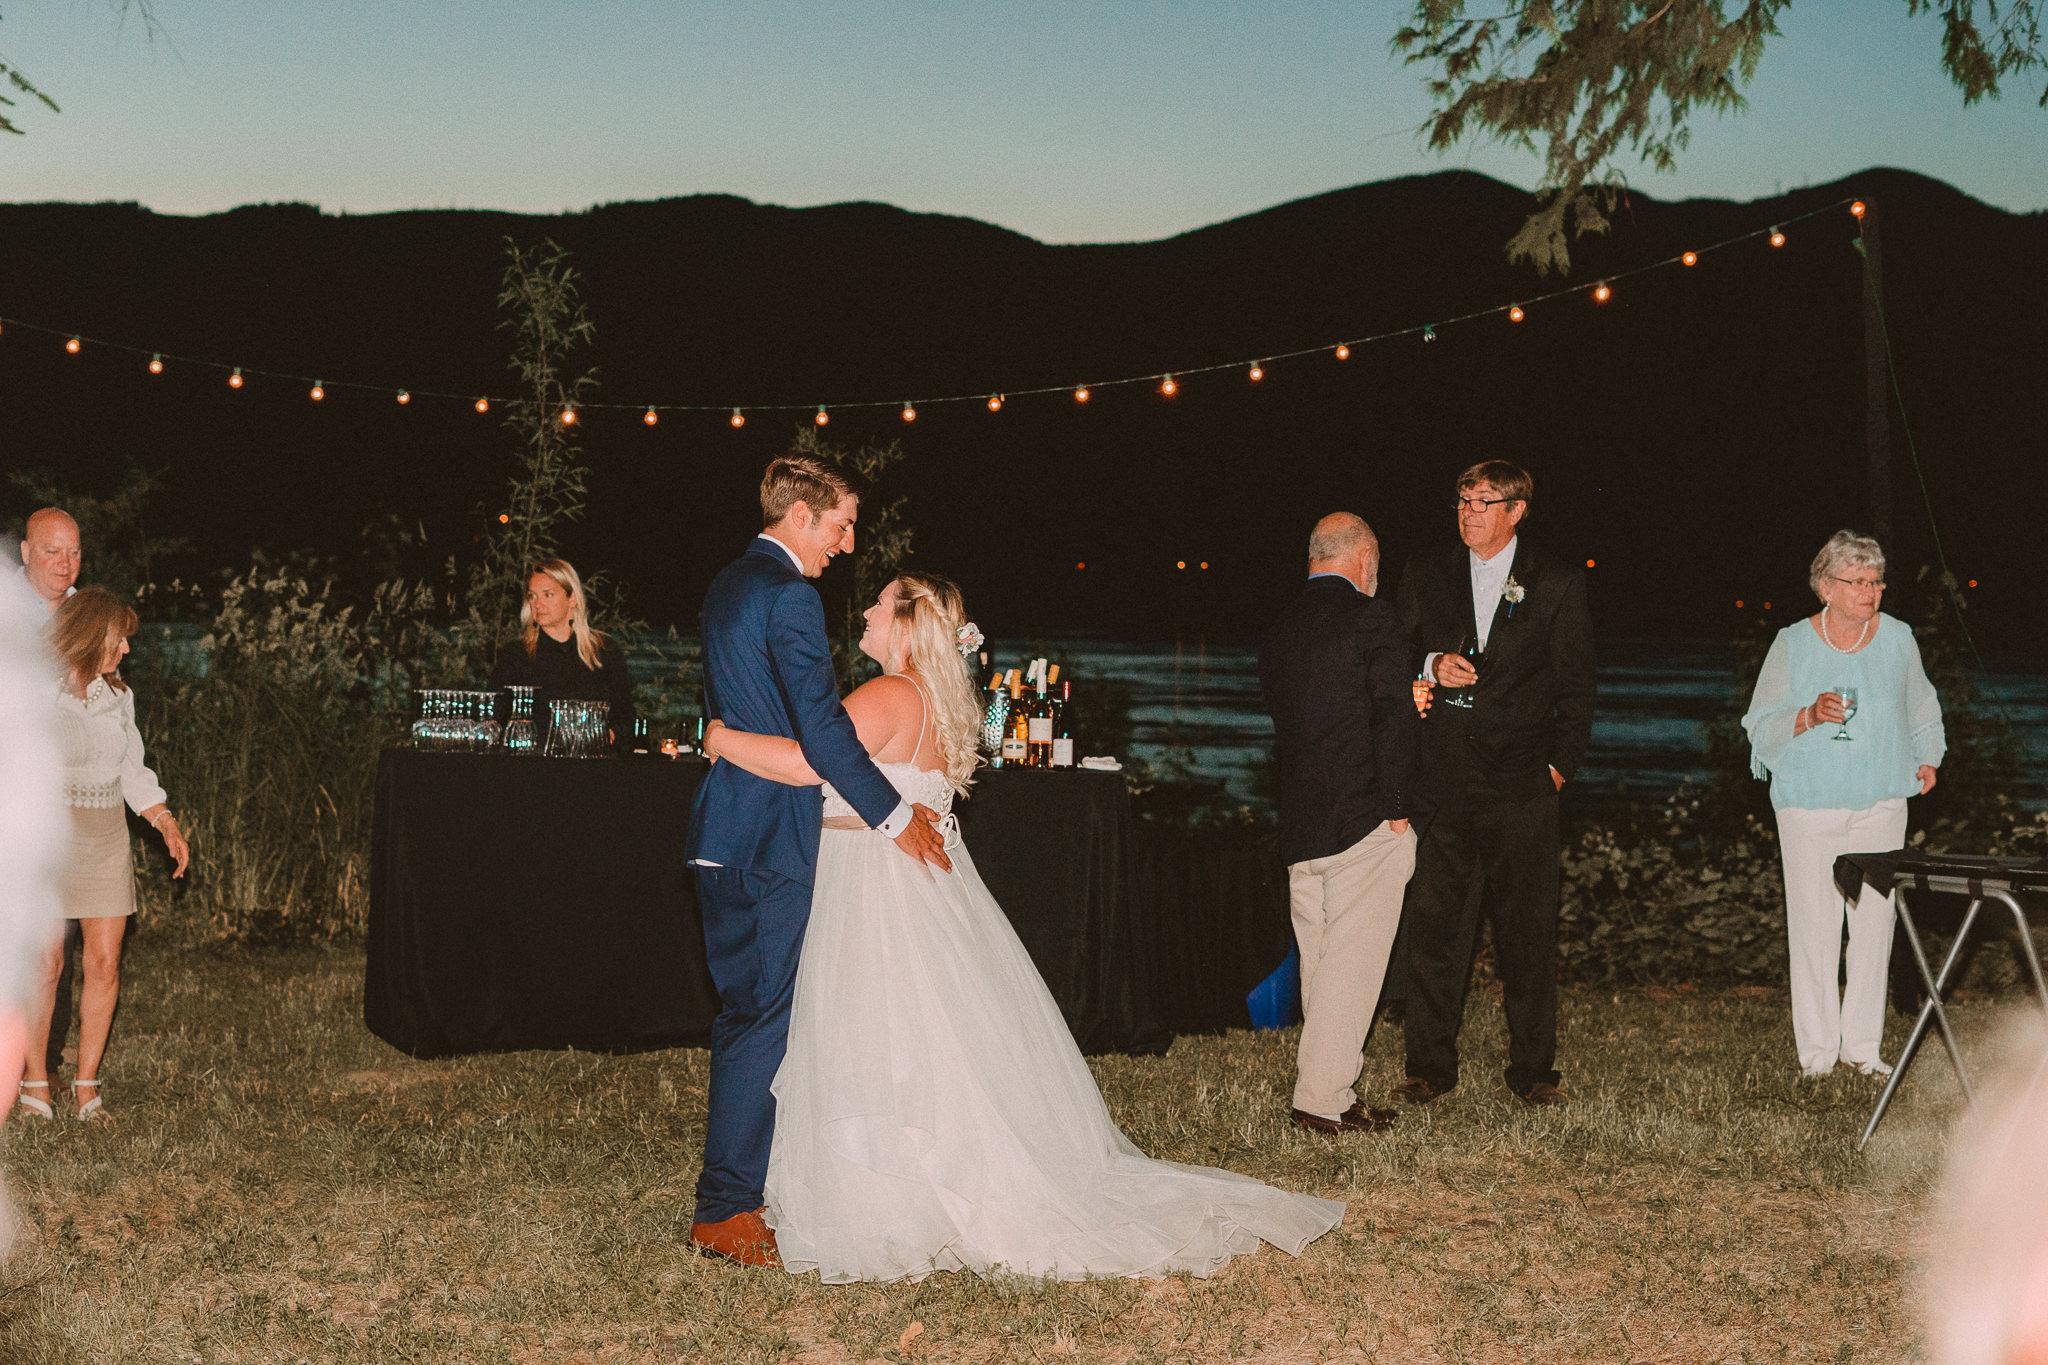 Bride Groom outdoor First Dance Columbia River Gorge Backyard wedding